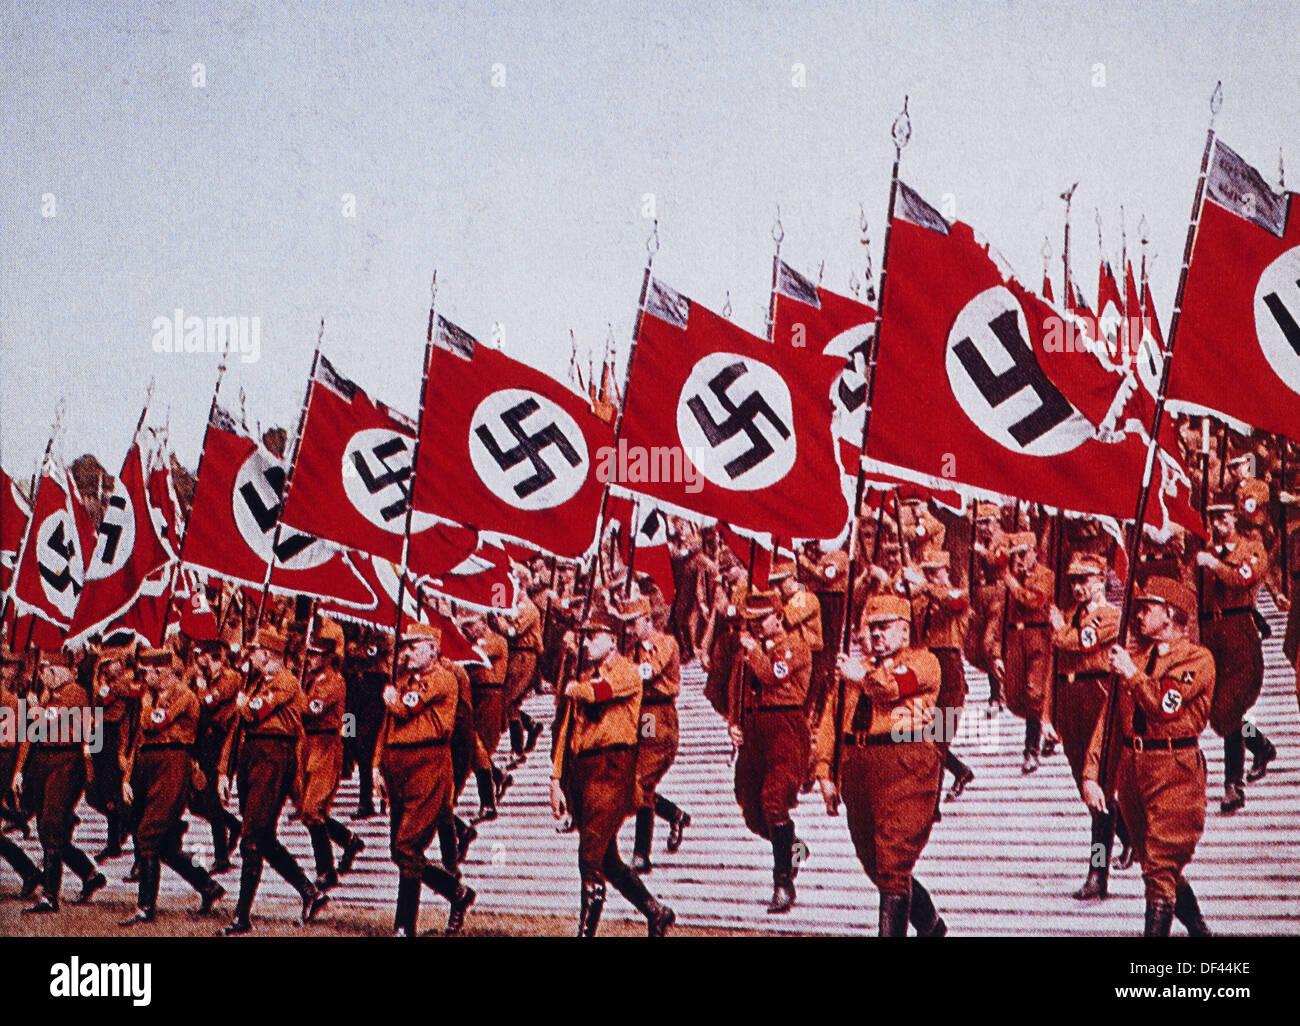 German SA Troops at Rally, Nurnberg, Germany, 1933 - Stock Image